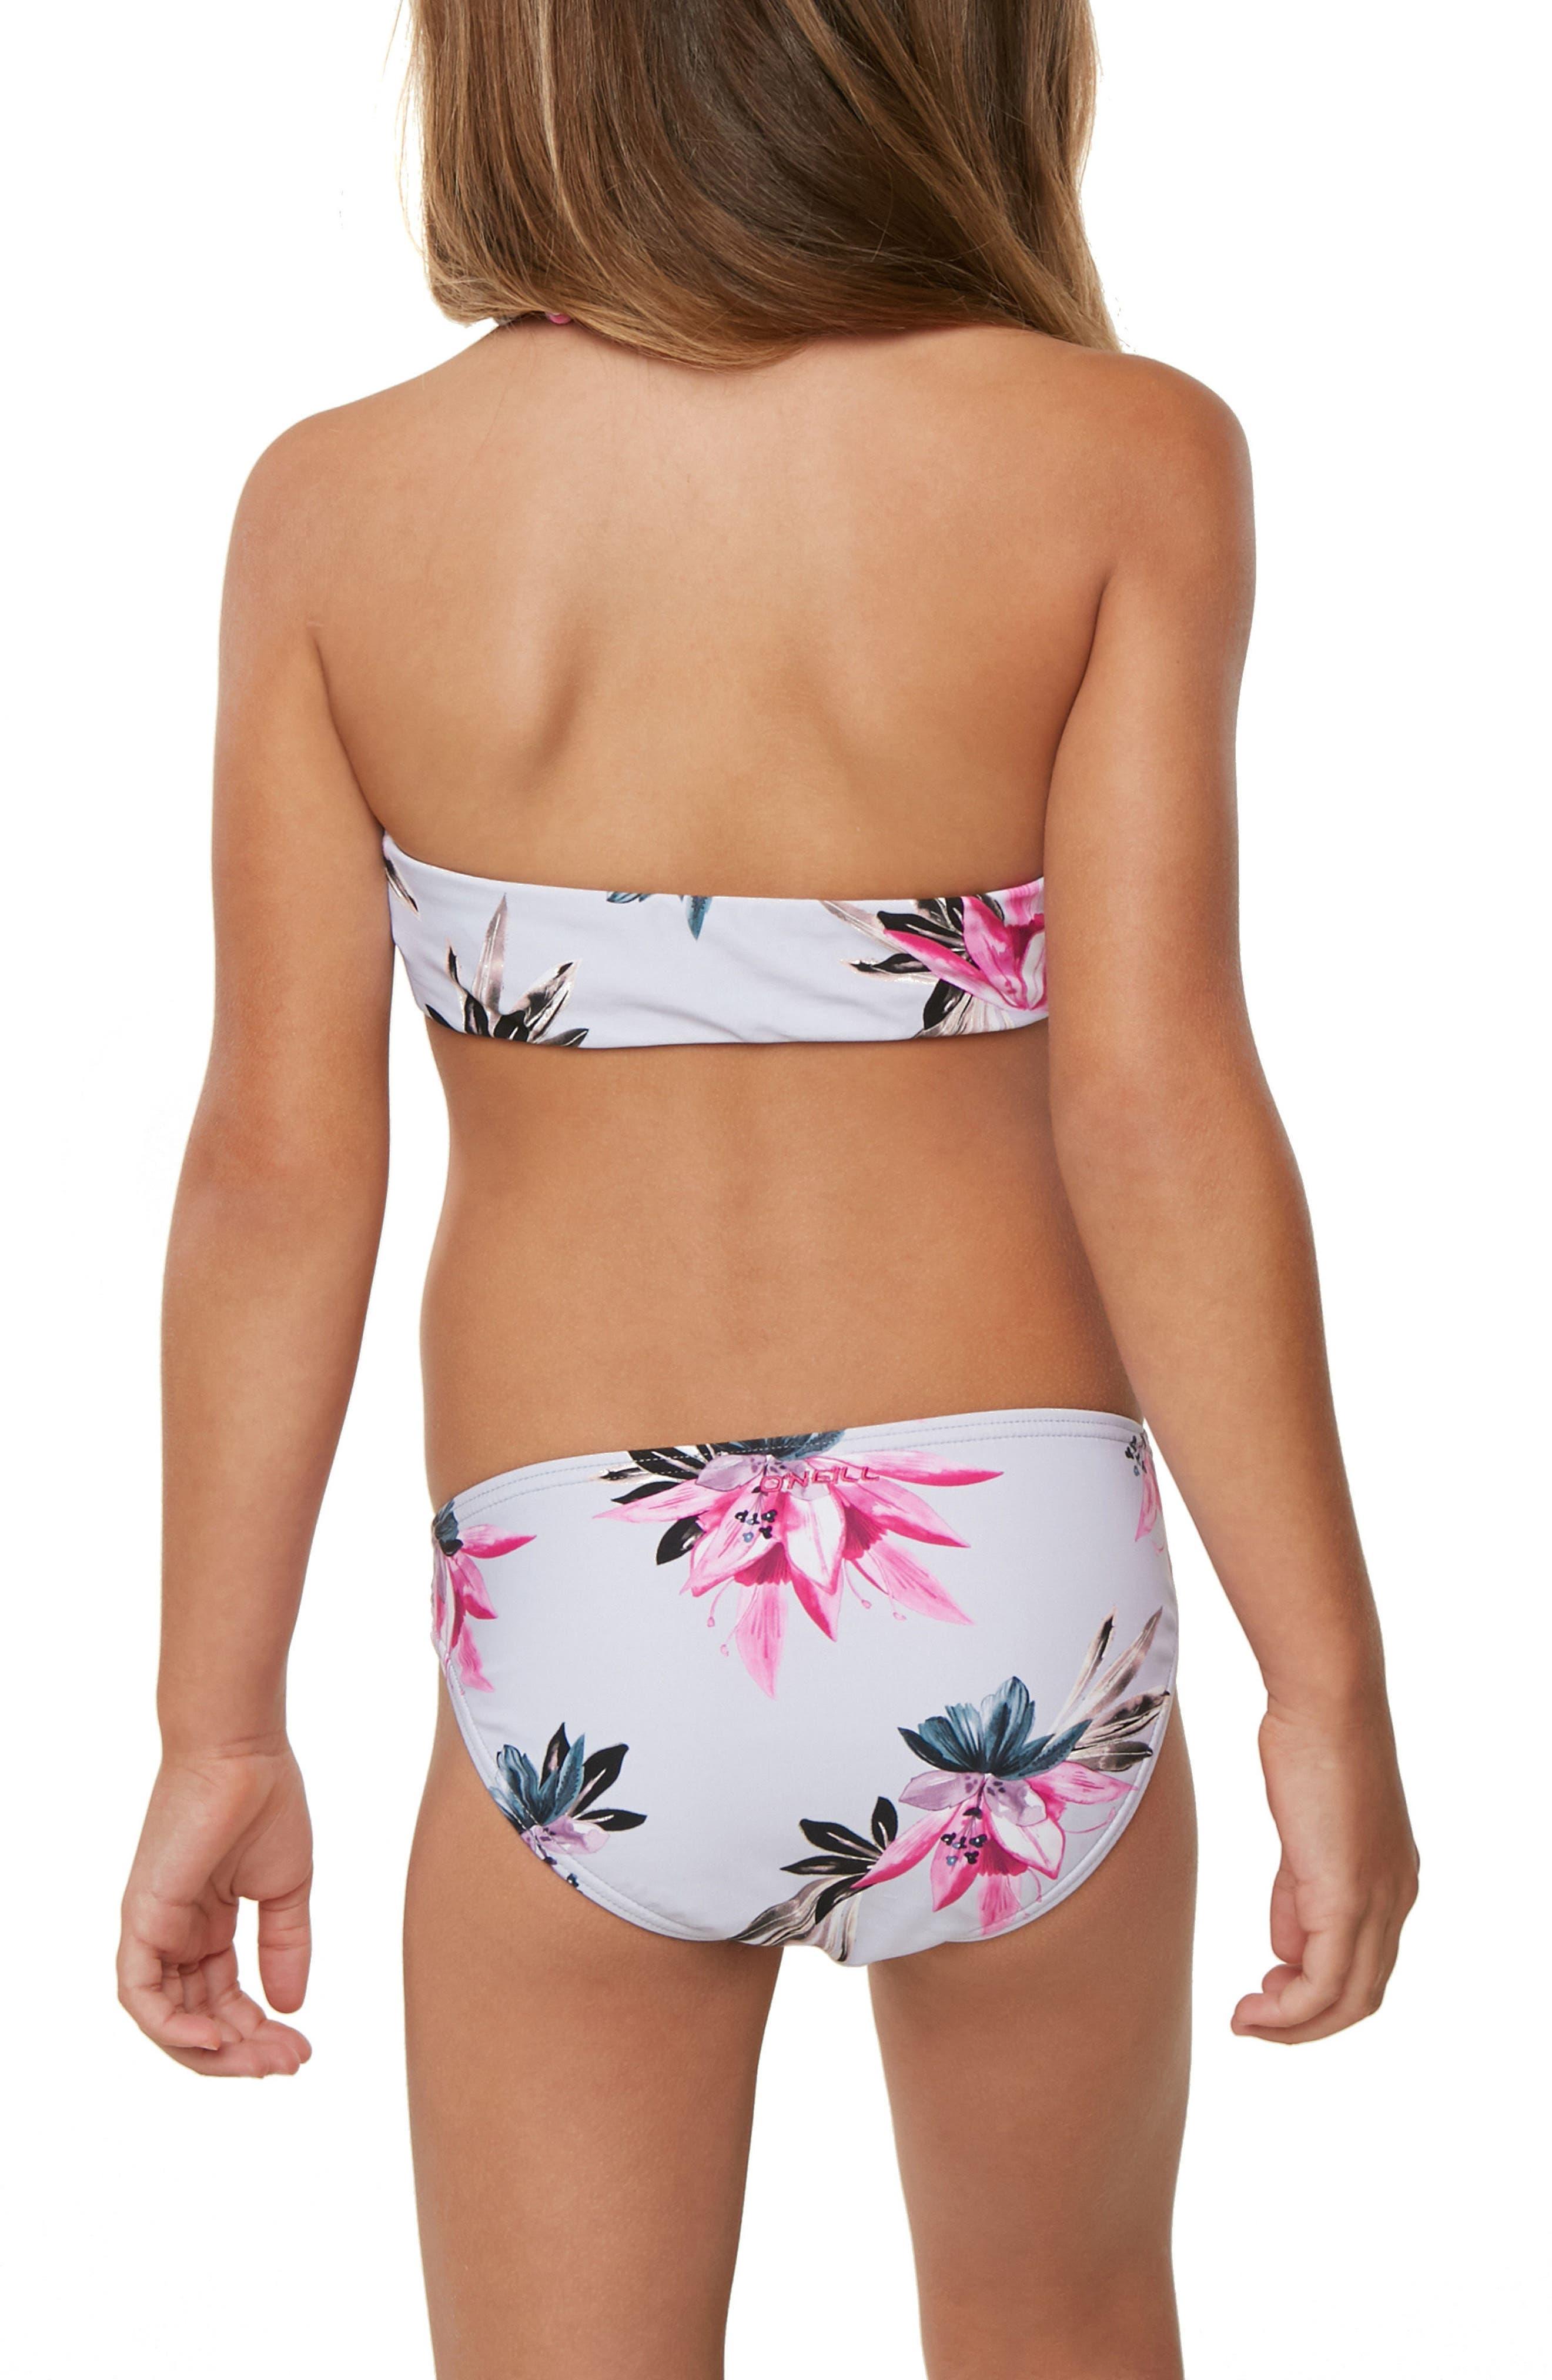 Mini Sydney Two-Piece Swimsuit,                             Alternate thumbnail 4, color,                             HORIZON